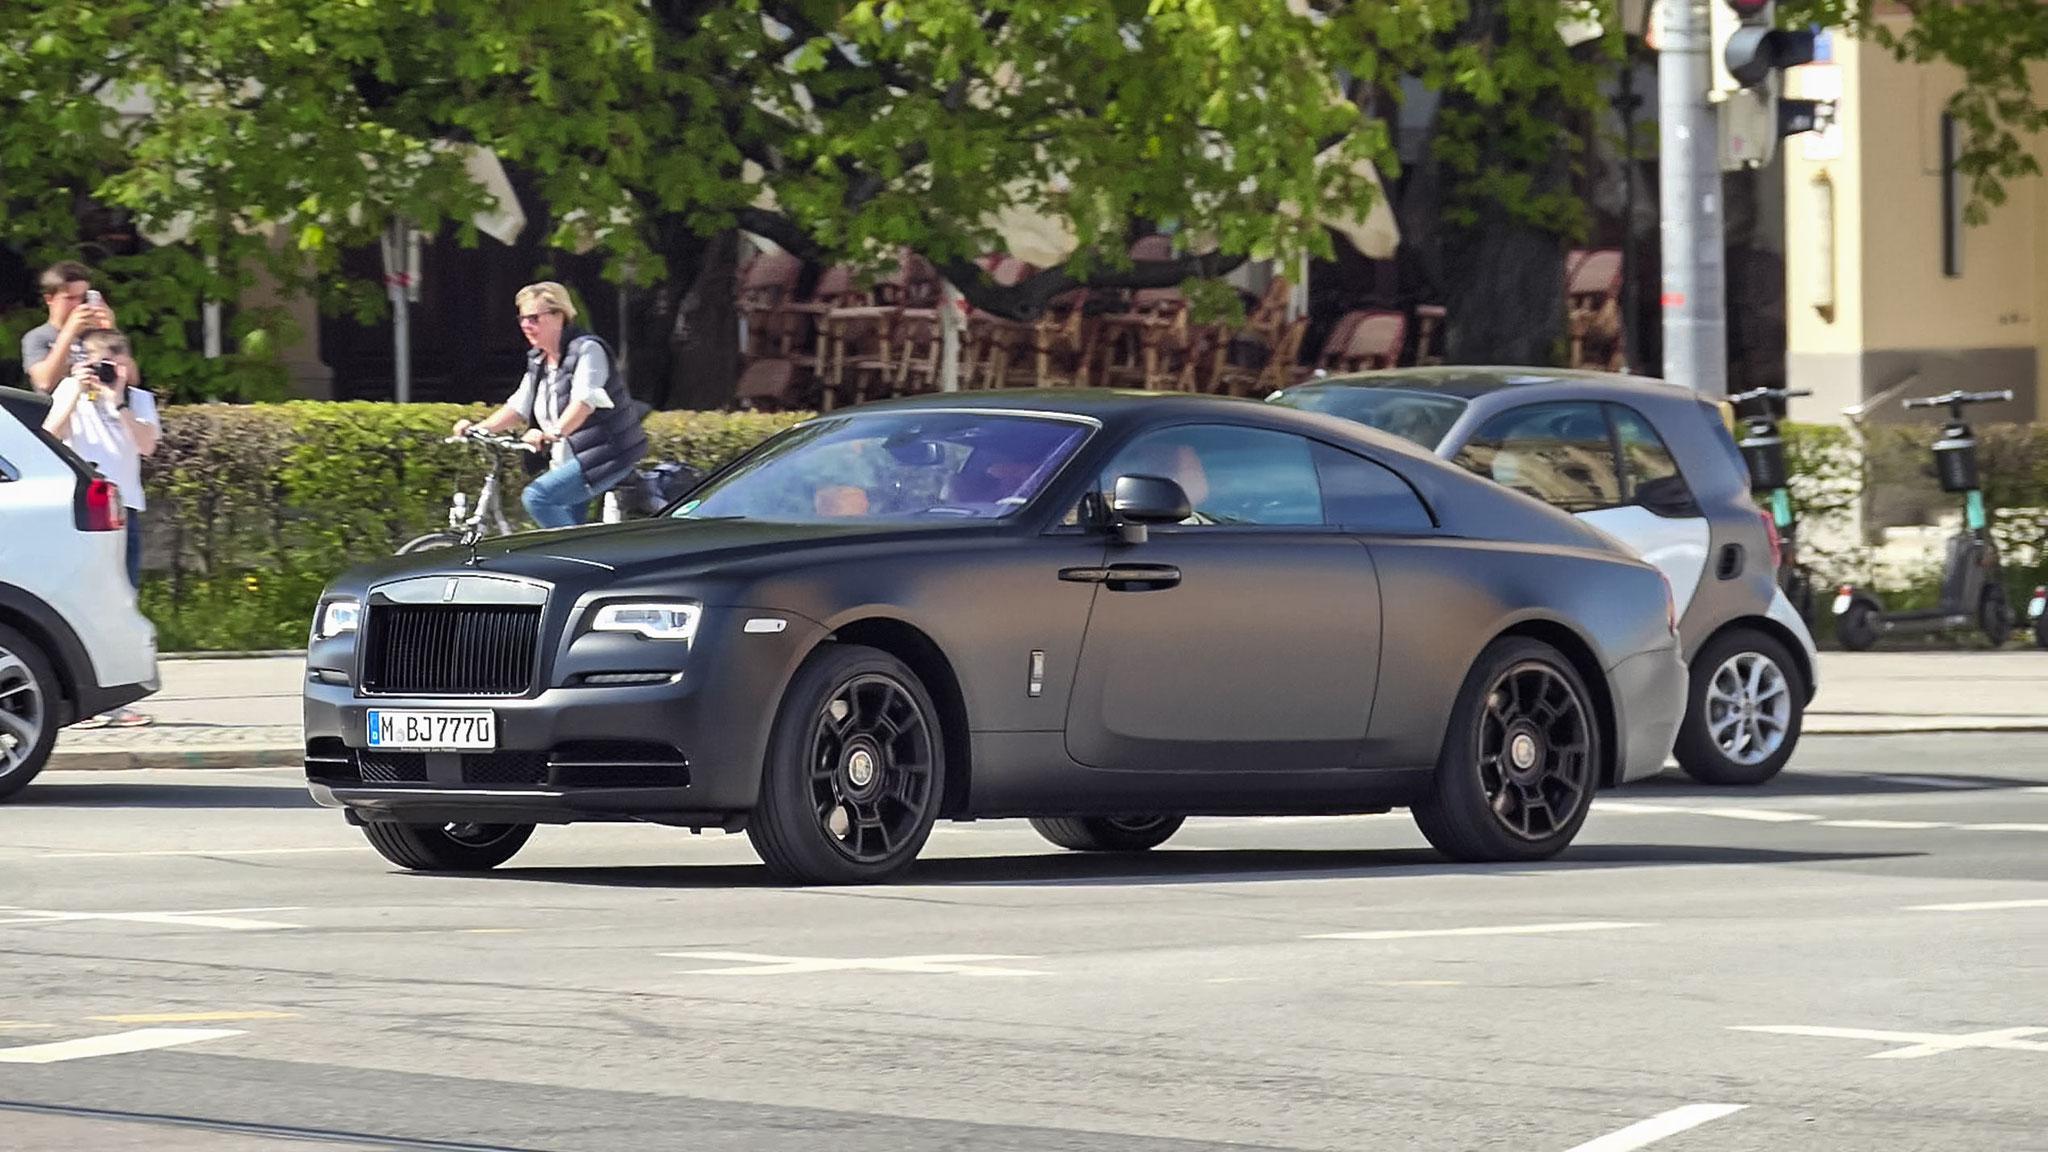 Rolls Royce Wraith - M-BJ-7770